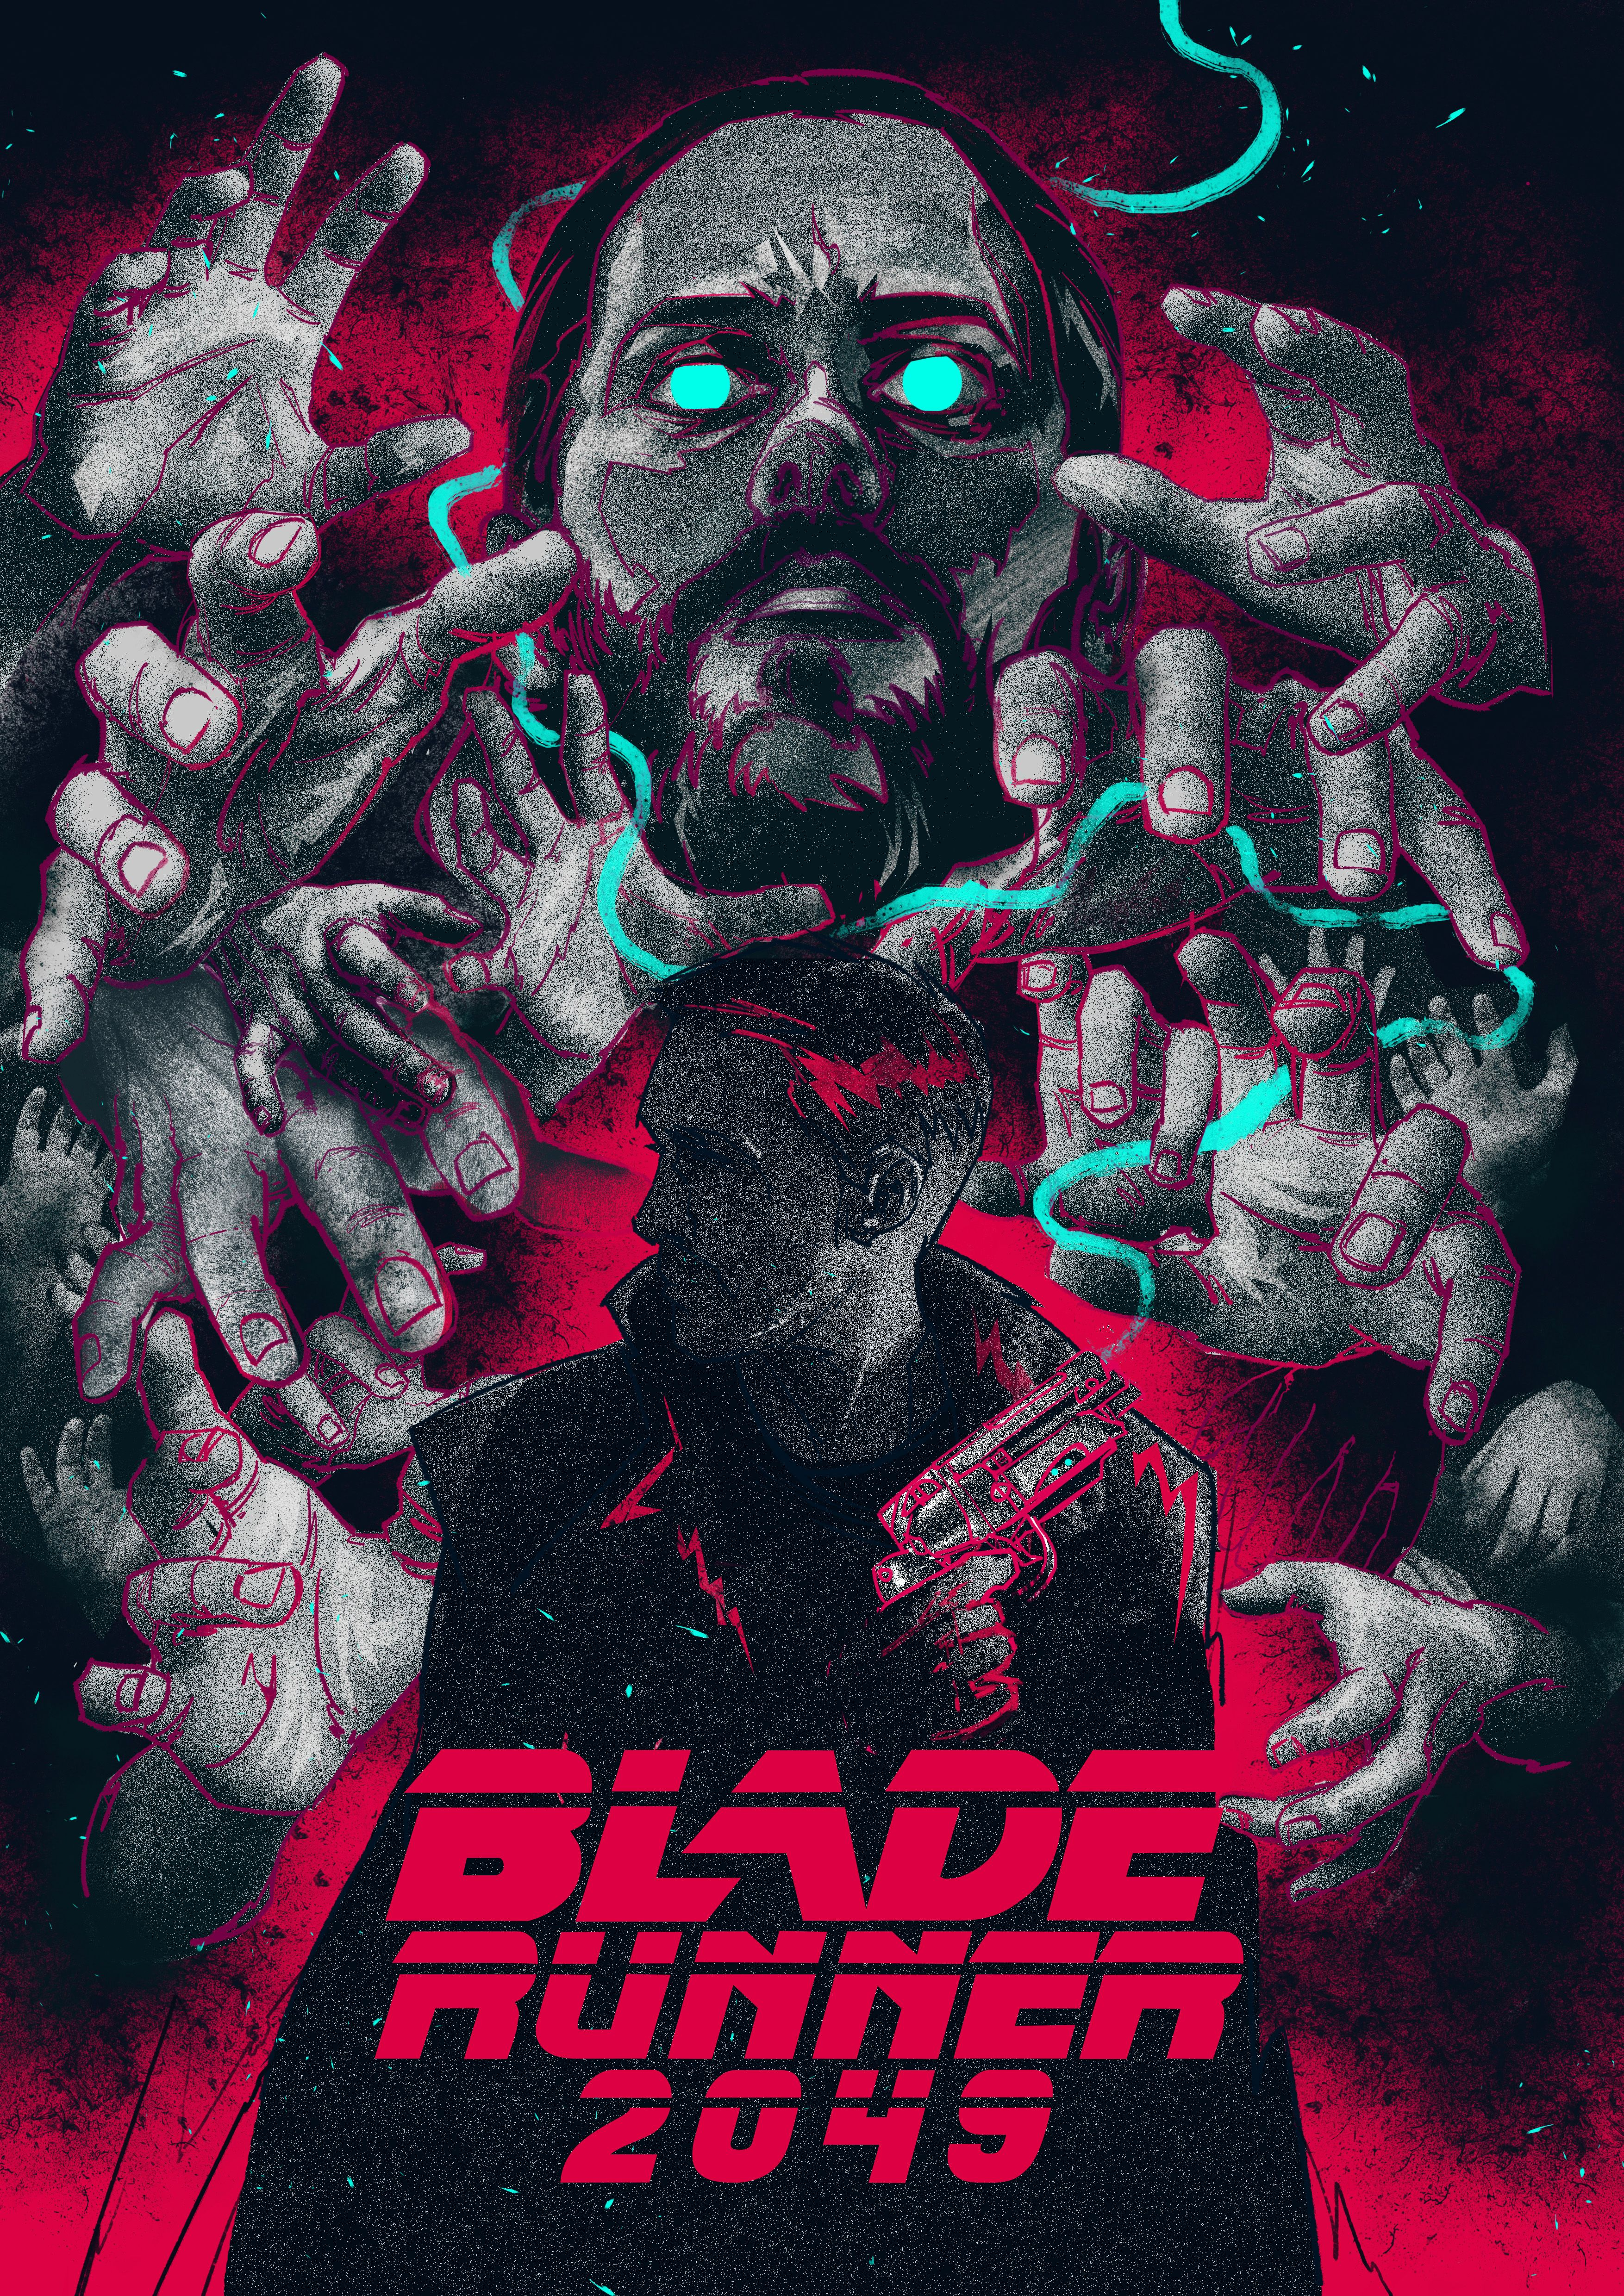 Blade Runner 2049 Bigtoe142 Hotmail Com Blade Runner Art Blade Runner Movie Posters Design